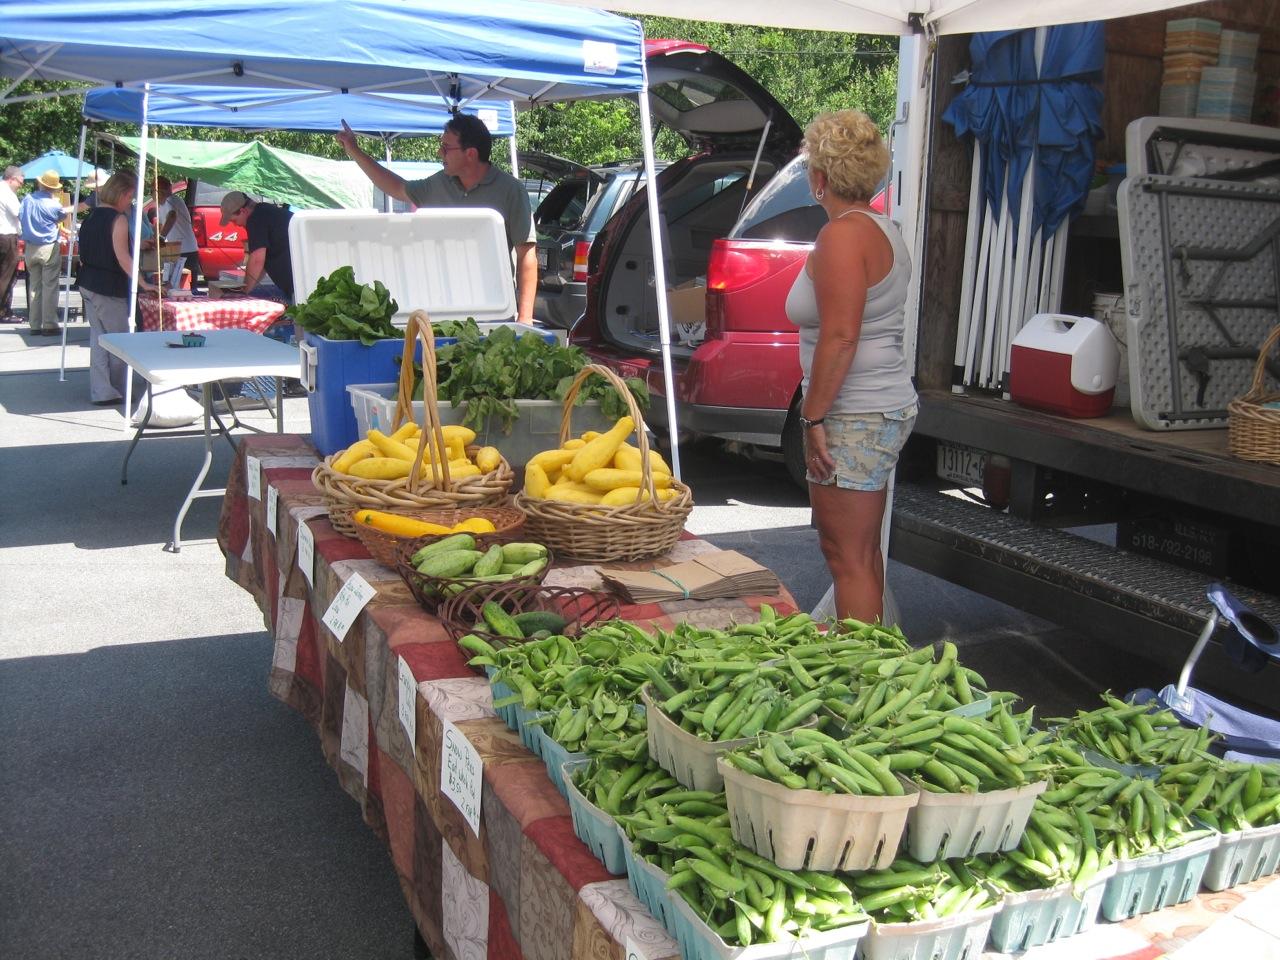 July 3: Clifton Park Market Opens